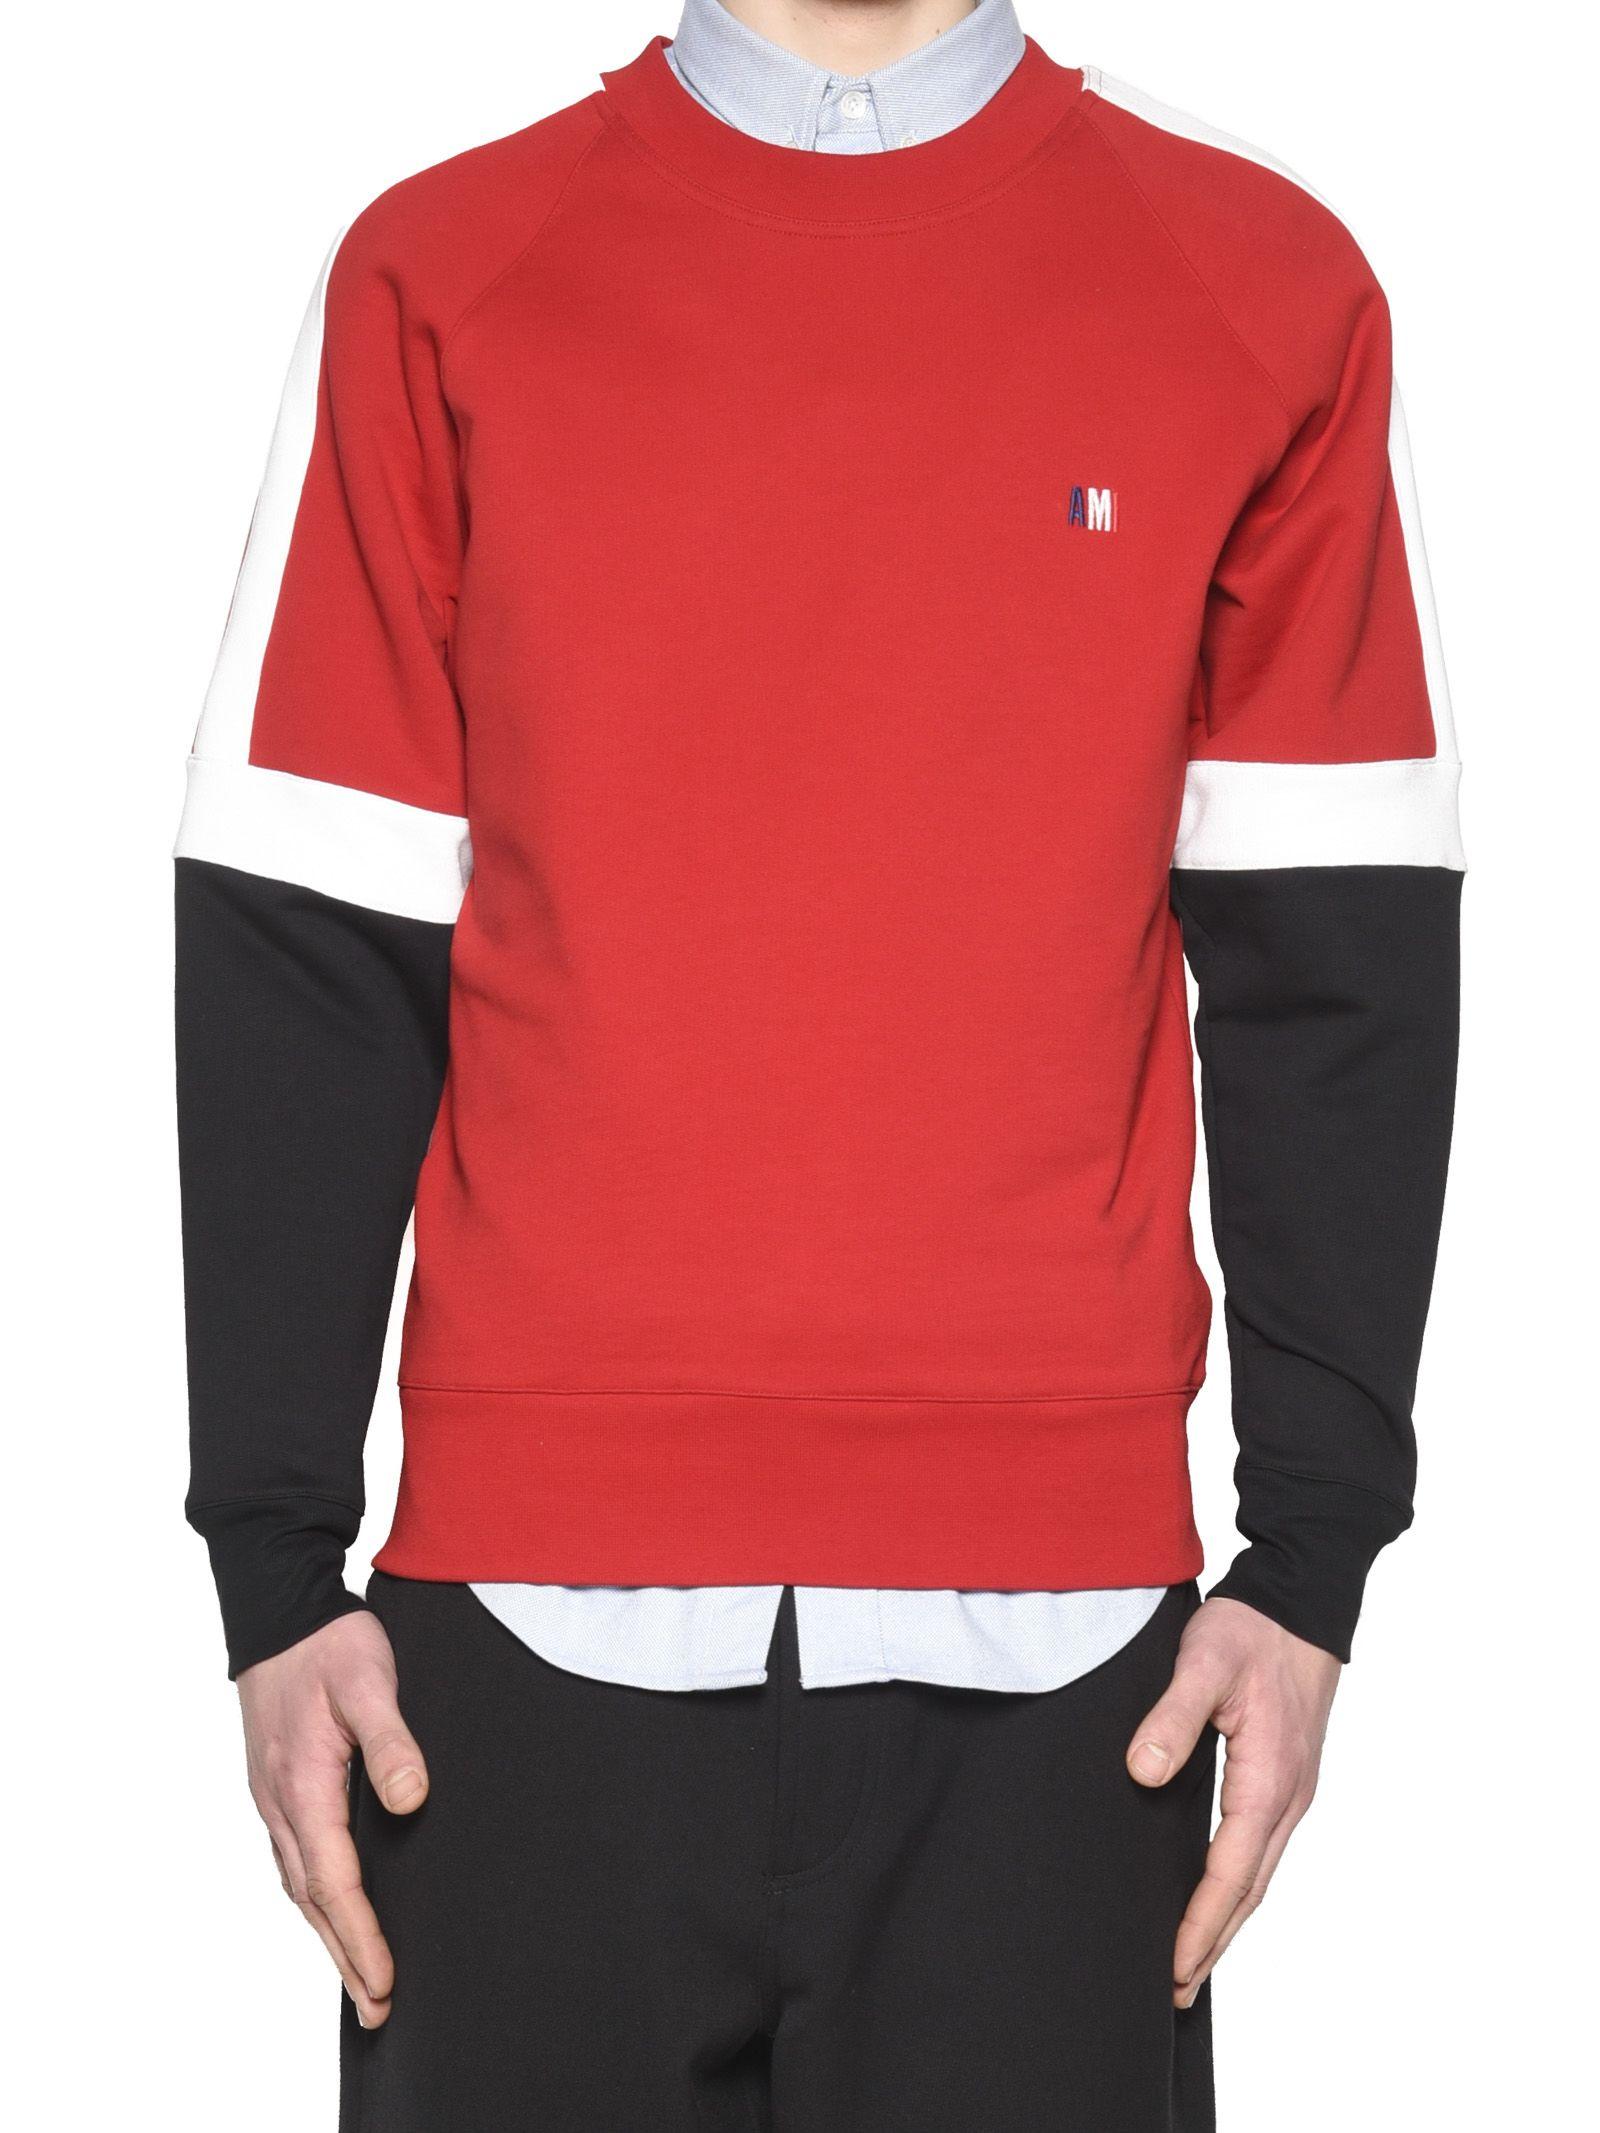 Ami Alexandre Mattiussi - Ami Alexandre Mattiussi Sweatshirt - Red ...